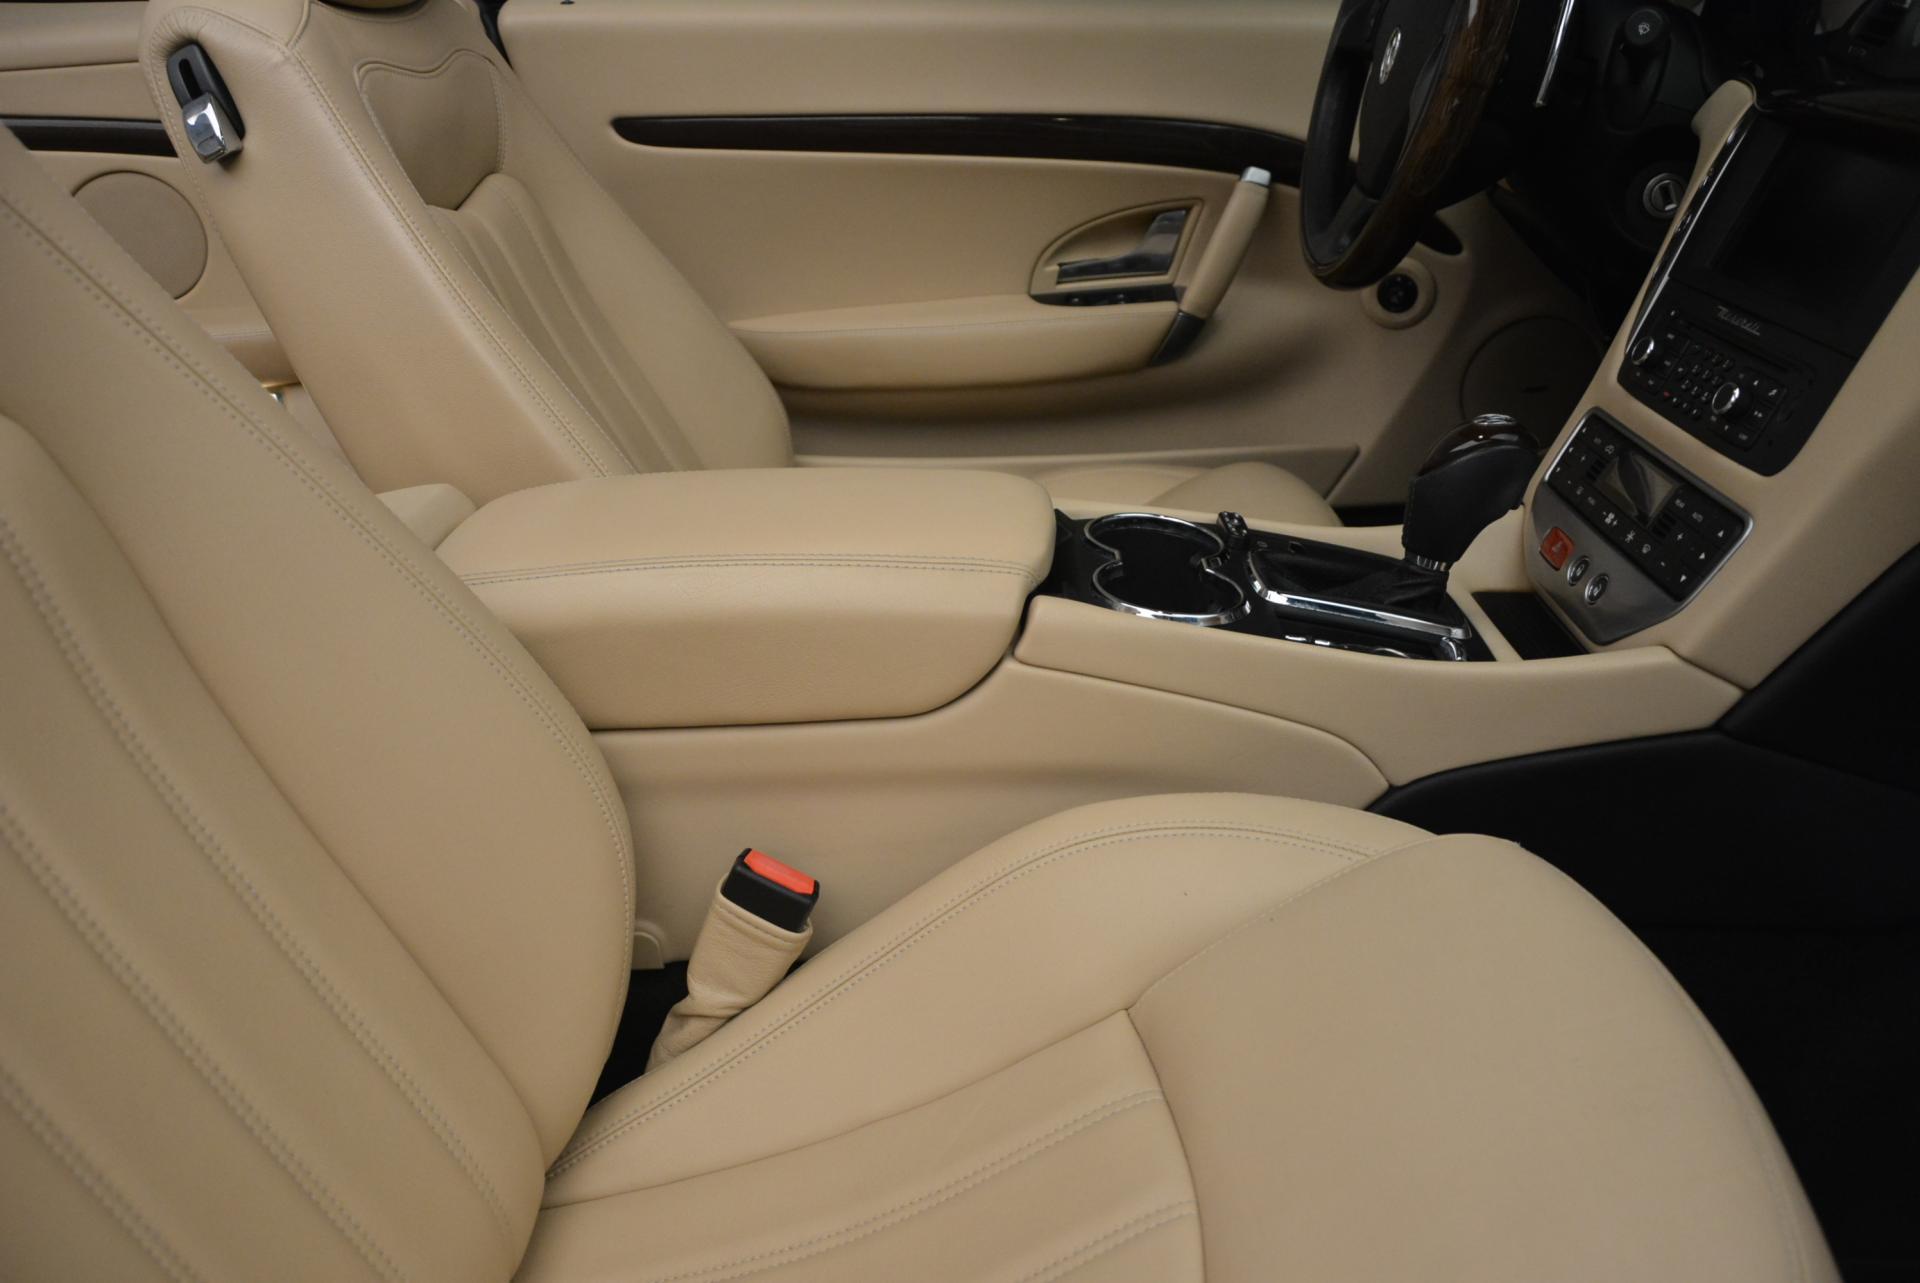 Used 2011 Maserati GranTurismo Base For Sale In Westport, CT 158_p32